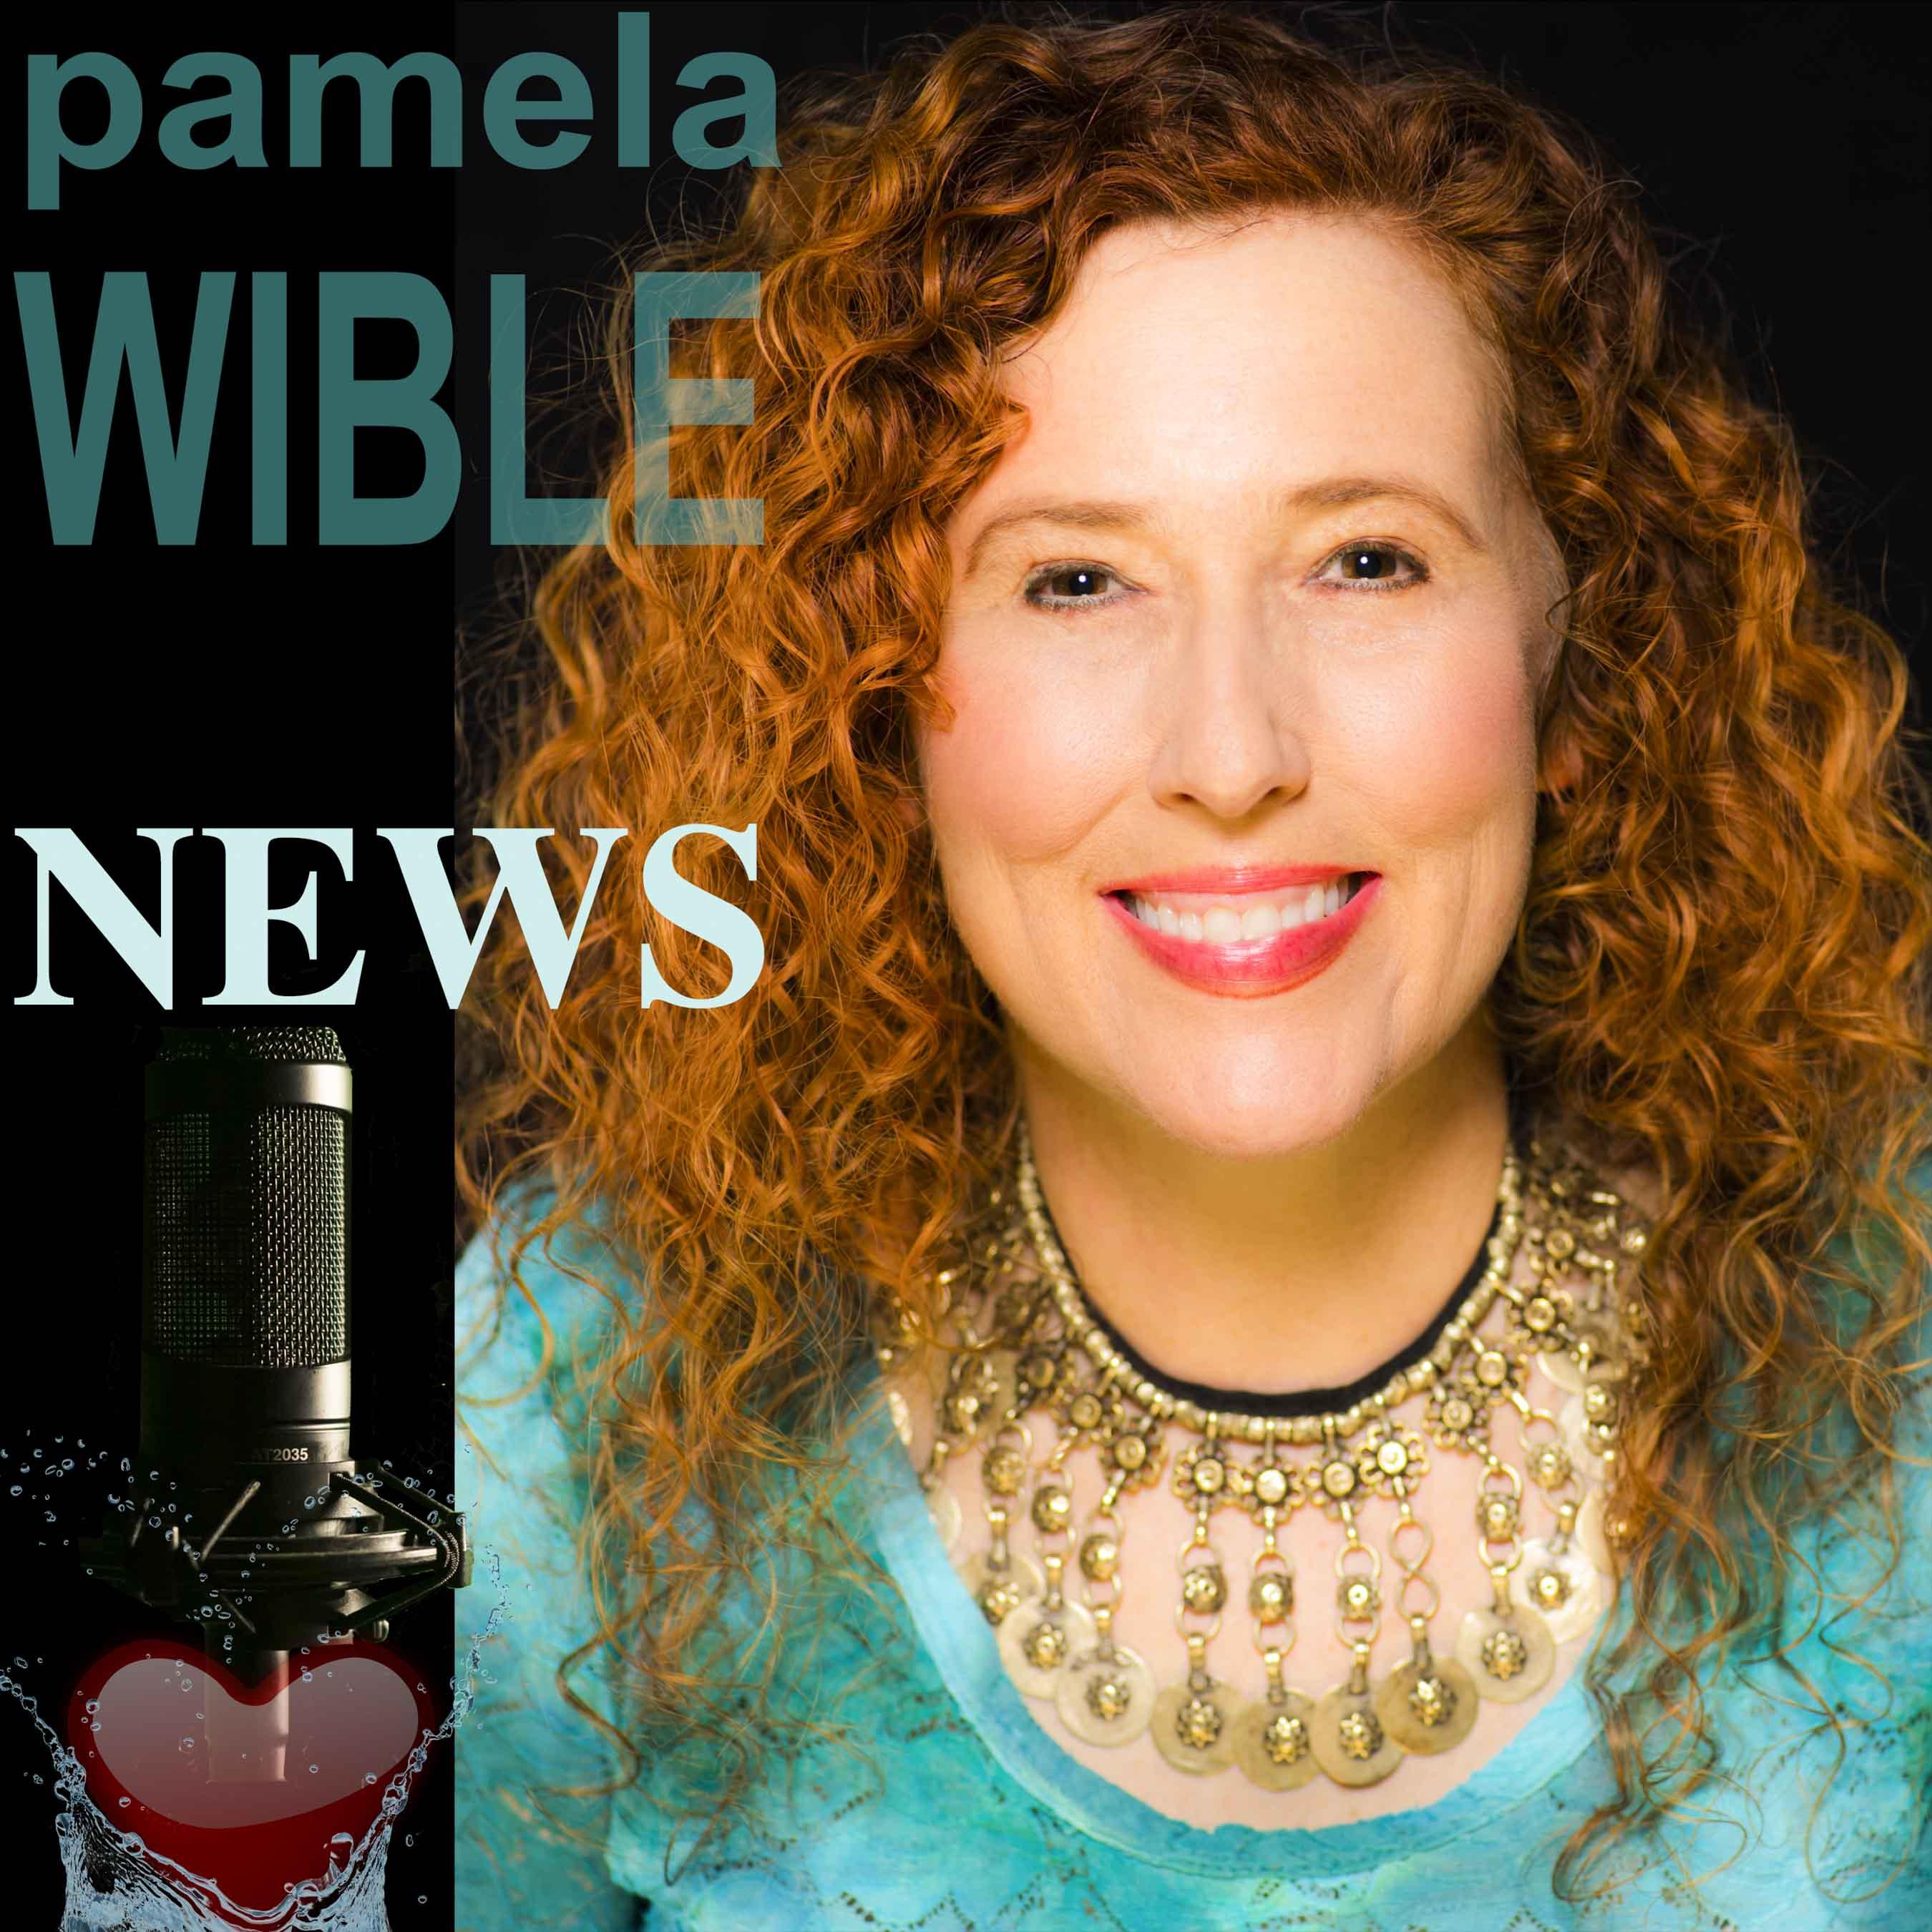 Pamela Wible Reports show art